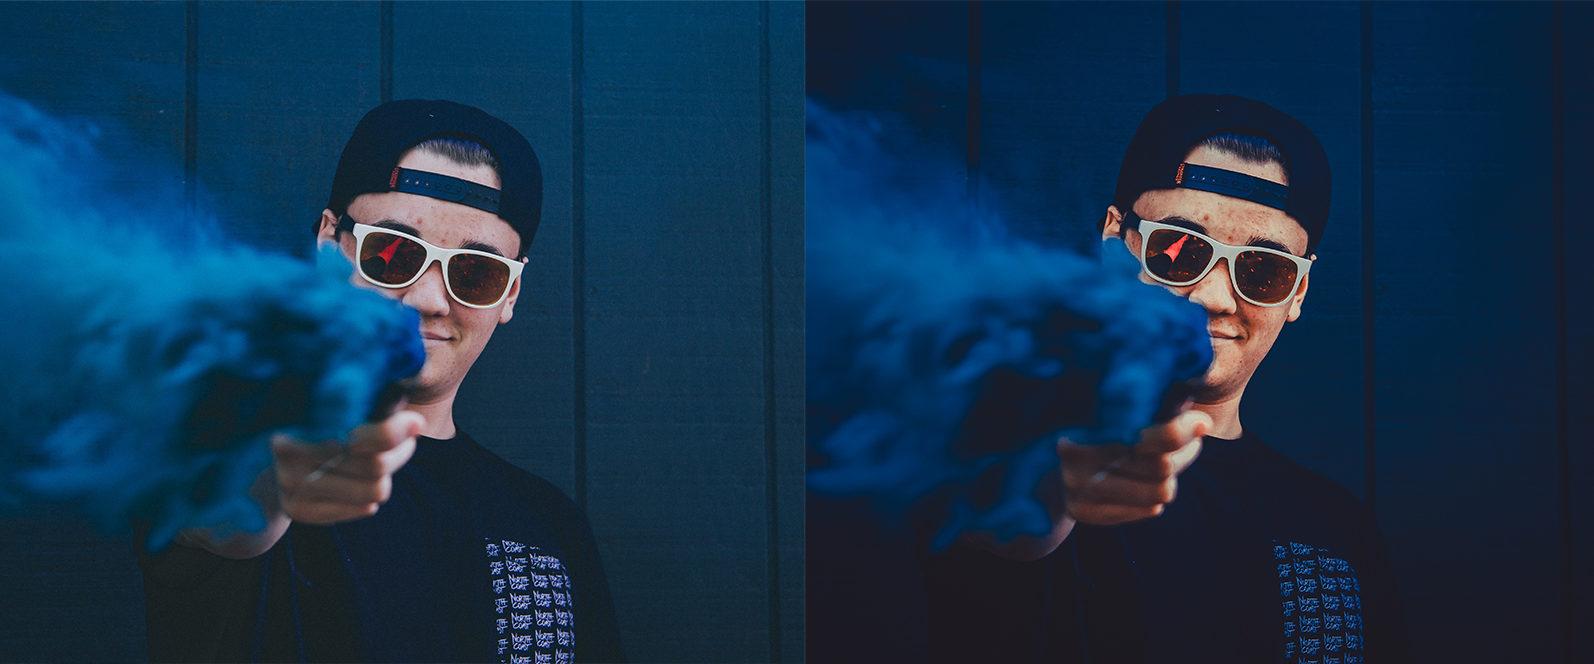 12 Smoke Bomb Lightroom Presets to enhance your Smoke Bomb Photoshoots - Preview 9 3 -